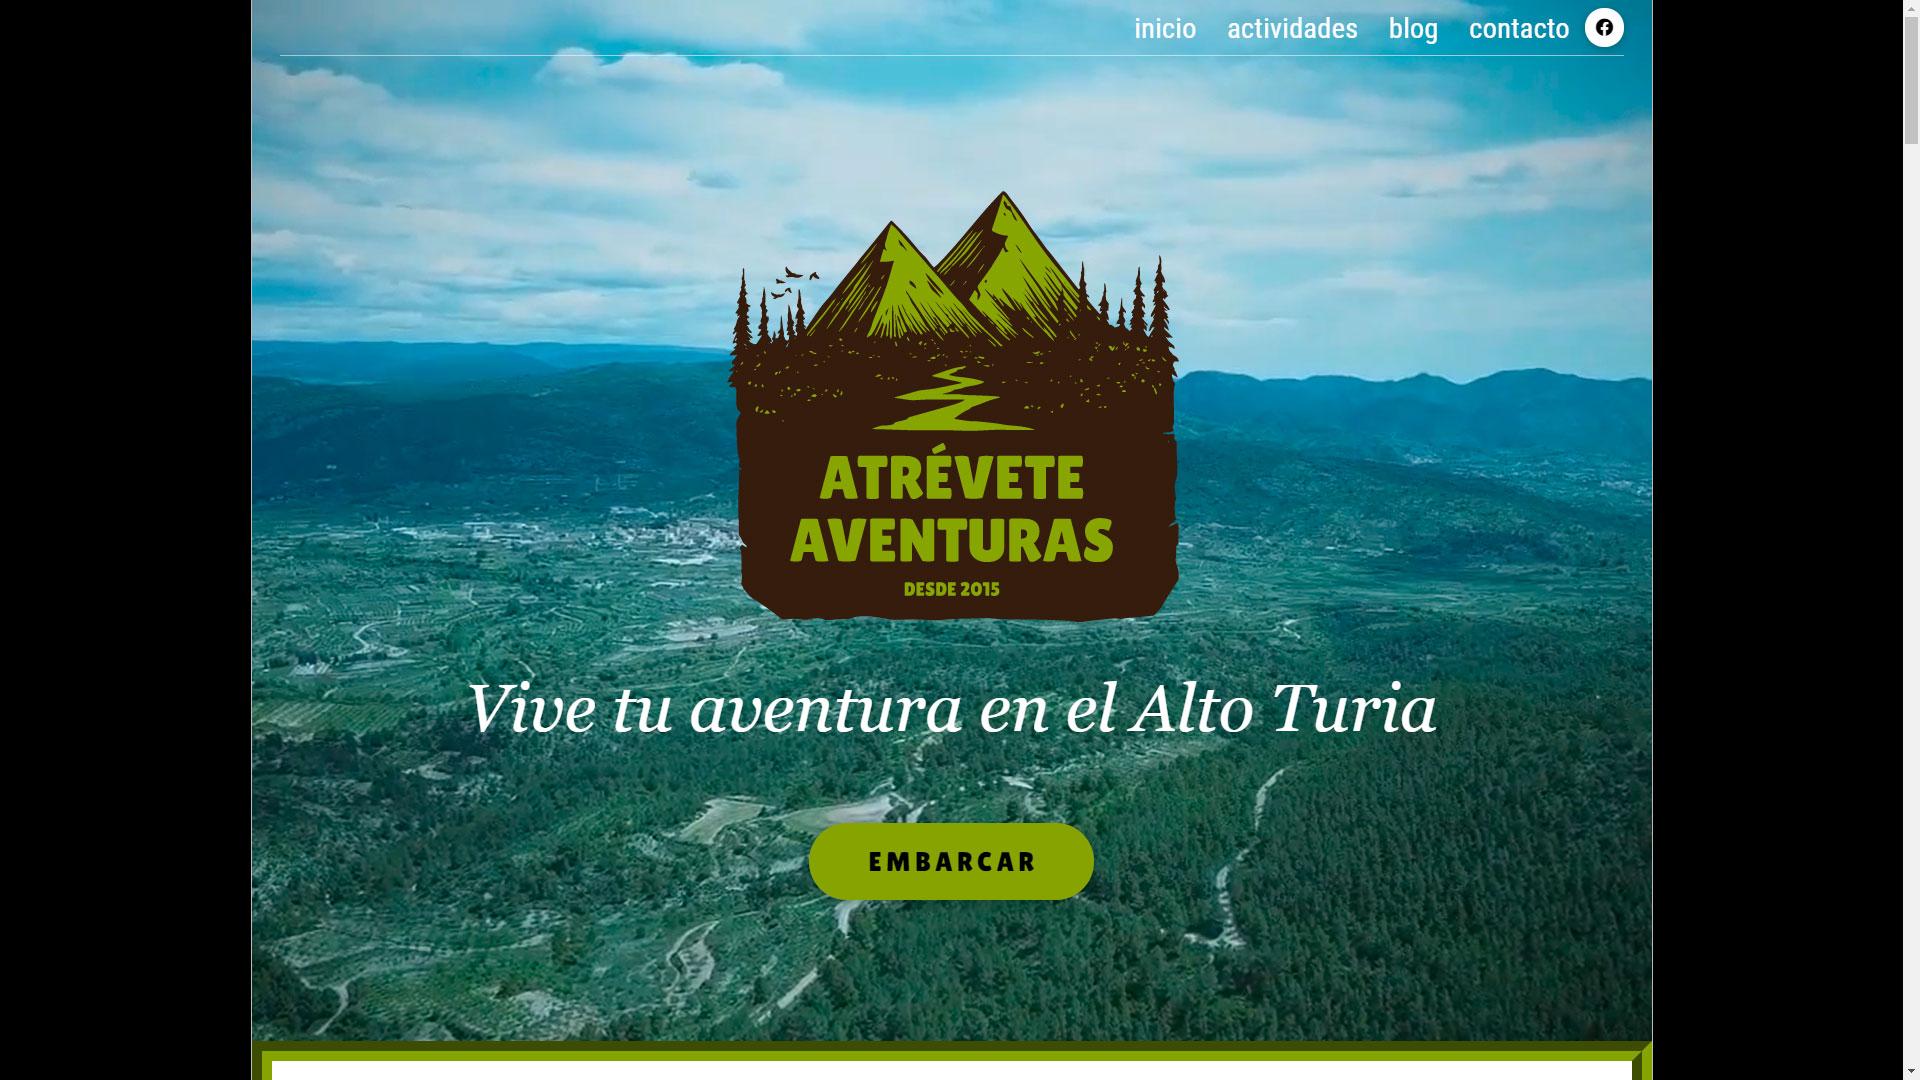 AtreveteAventuras web